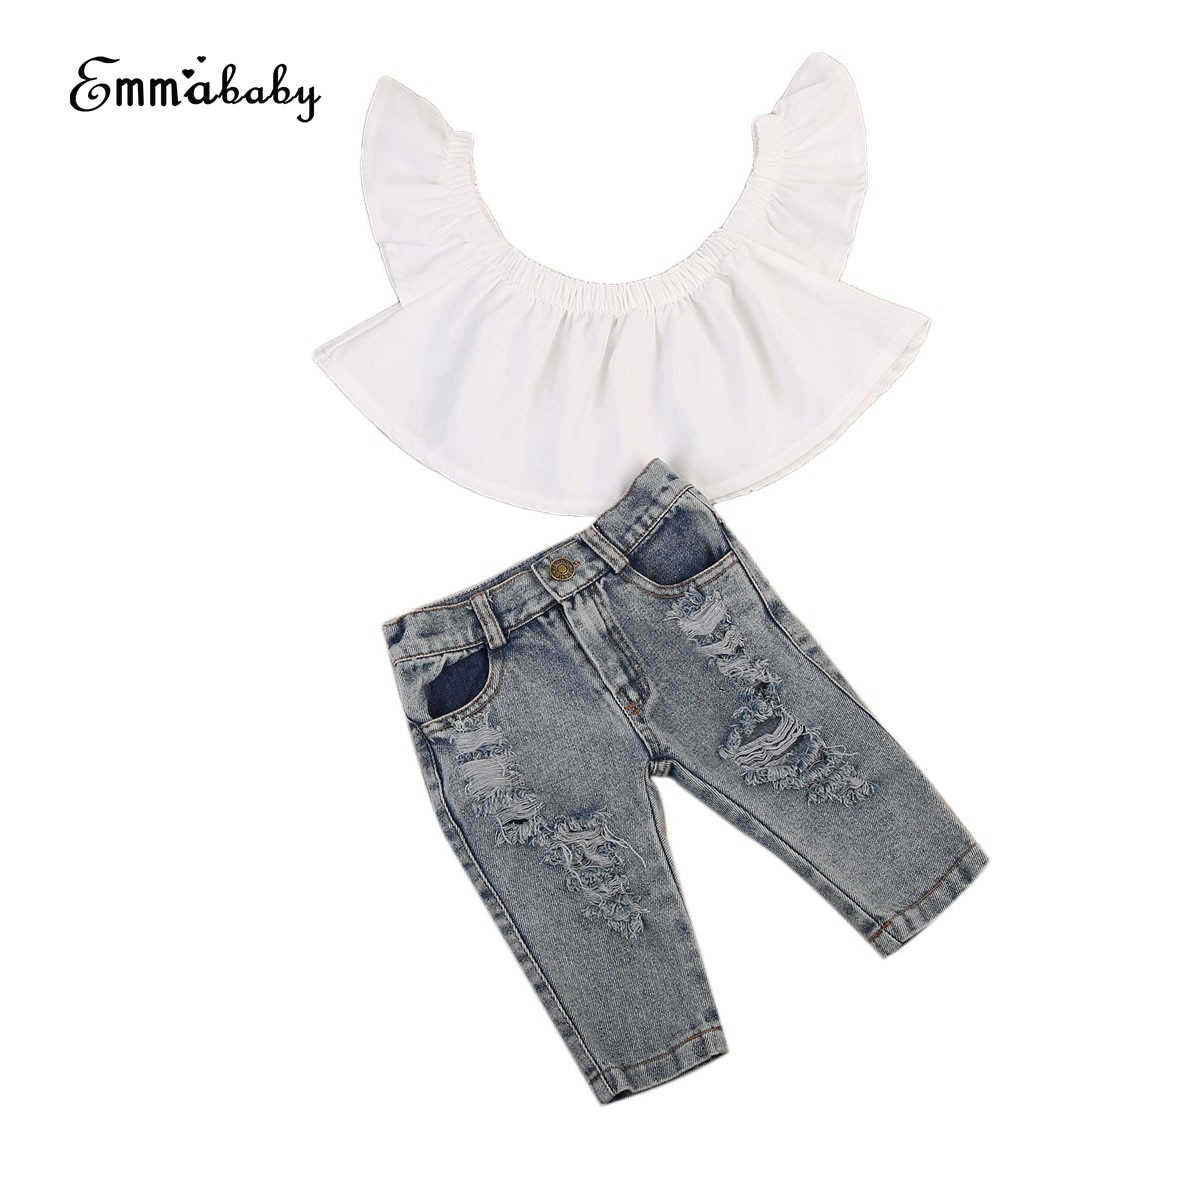 Emmababy 2pcs Clothes Set!! Newest Kid Baby Girl Clothes Set Infant Children Off Shoulder Tops Denim Jeans Outfits Clothes